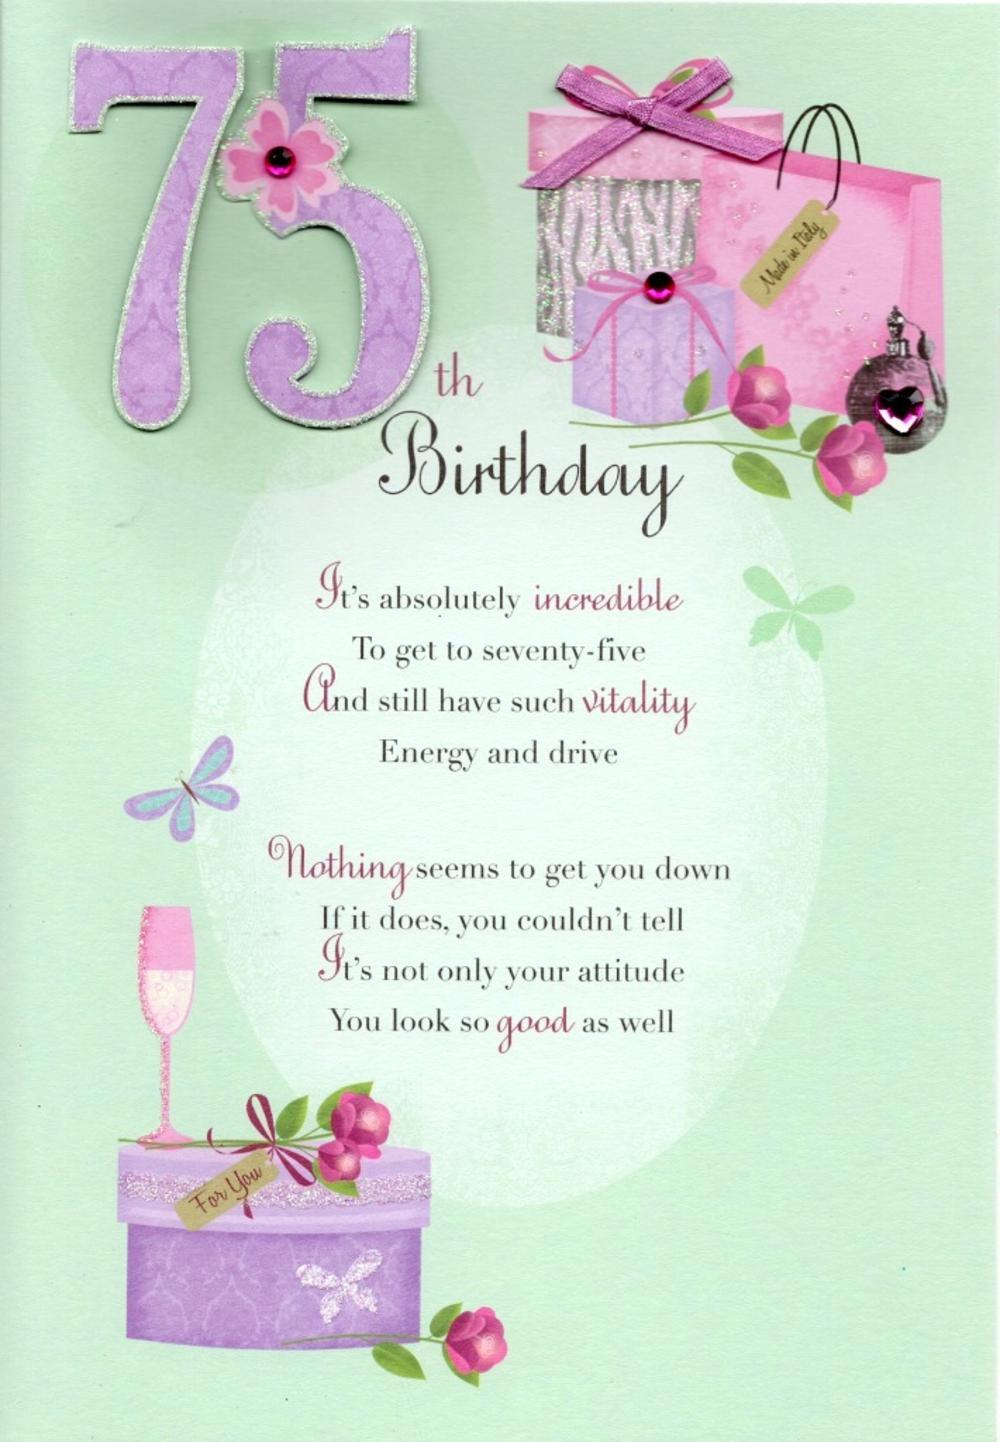 75th happy birthday greeting card  cards  love kates